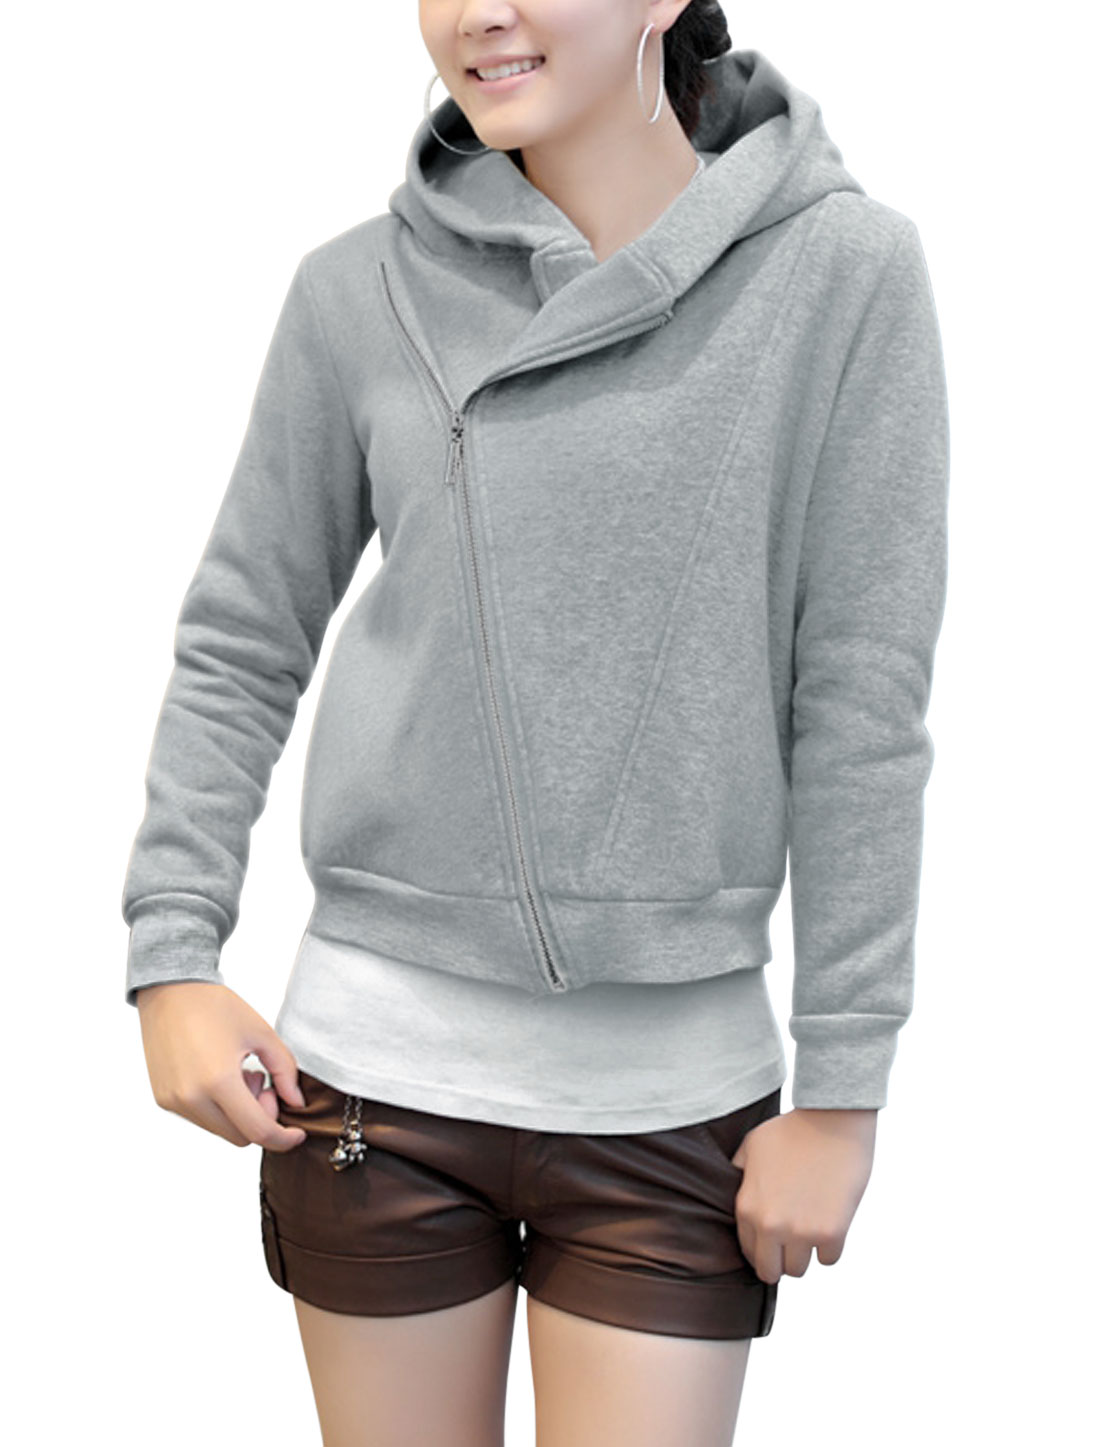 Lady Inclined Zipper Long Sleeve Leisure Sweatshirt Light Gray S